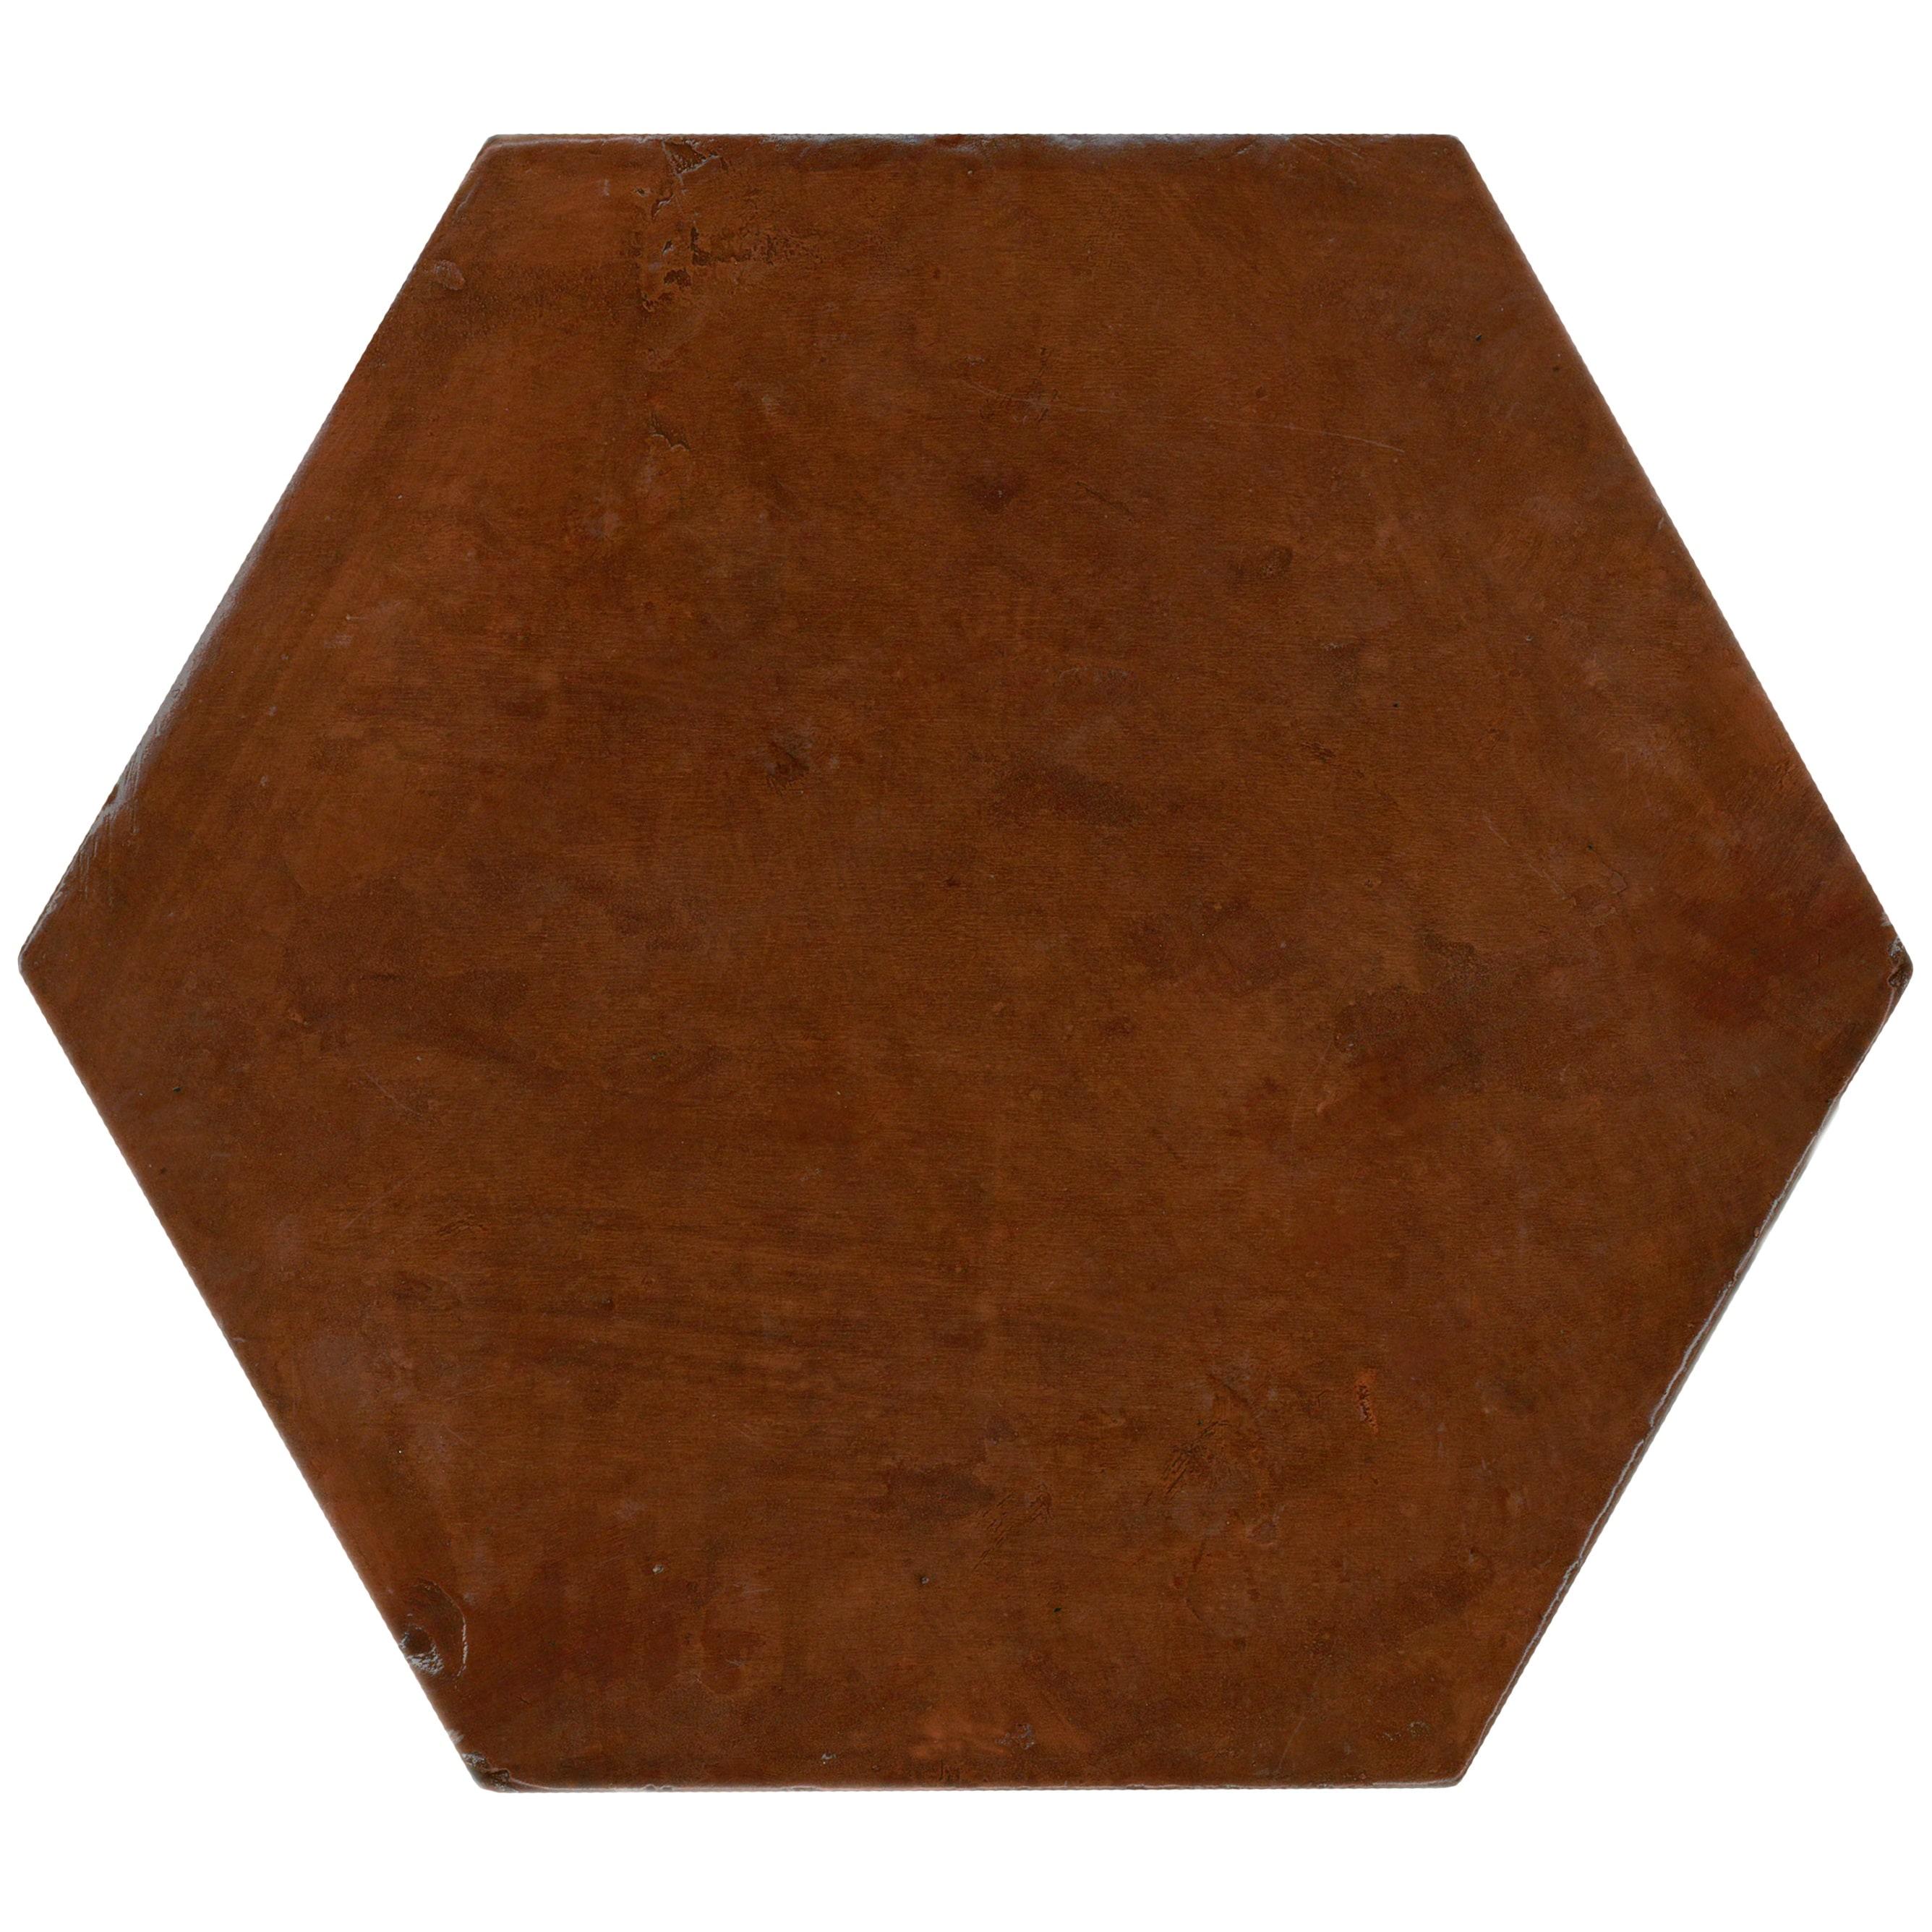 Gbi Tile Stone Inc Drp 12